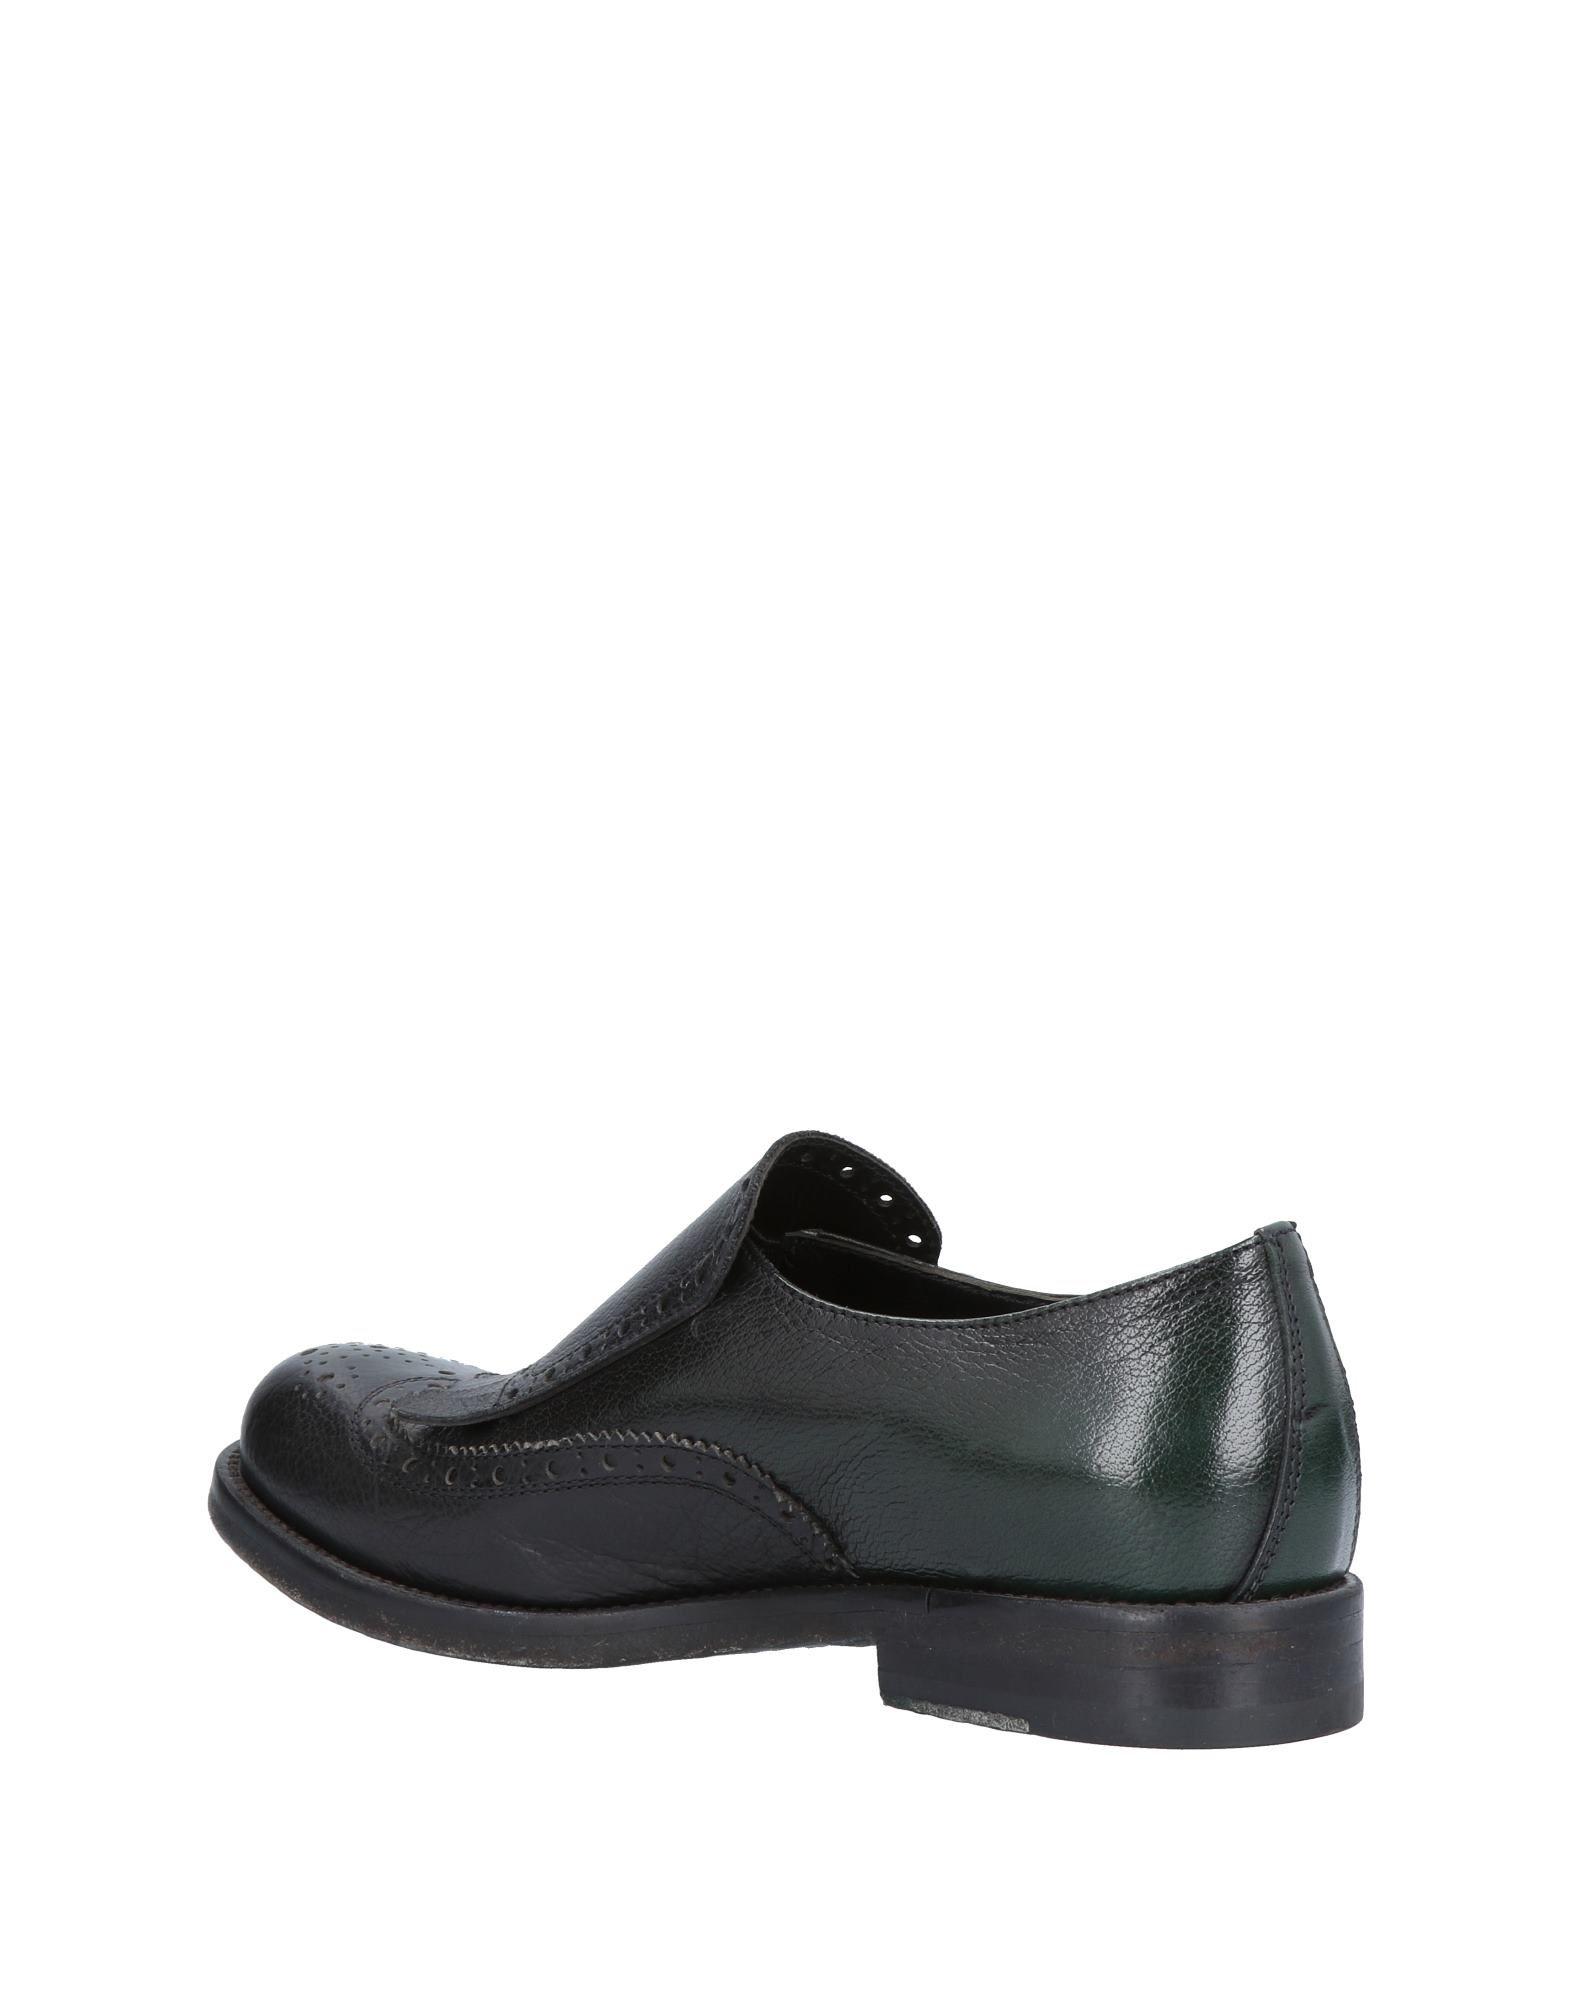 Gut um Mokassins billige Schuhe zu tragenElisabetta Neri Mokassins um Damen  11483530UB 3a4b69